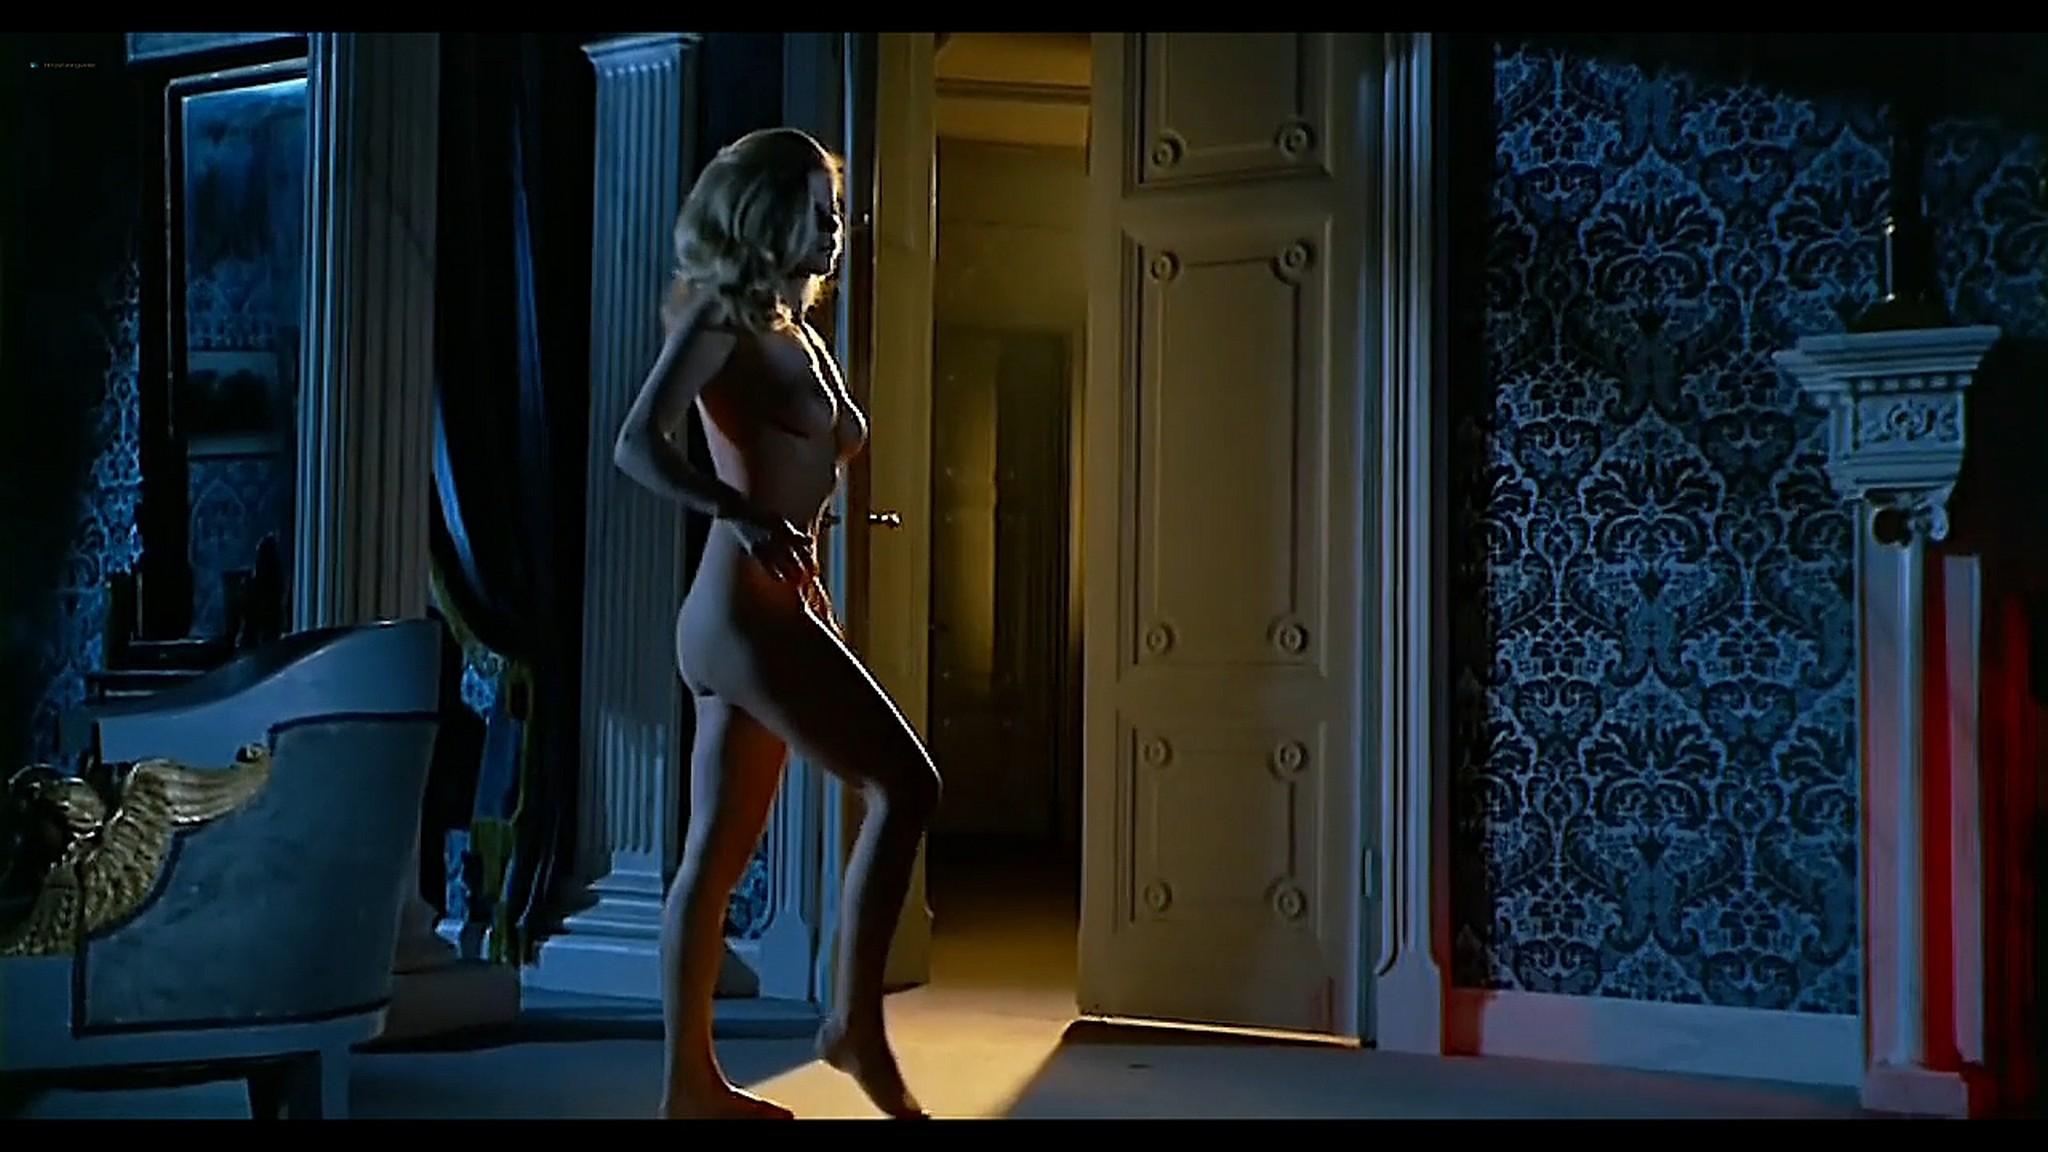 Joey Heatherton nude topless Sybil Danning Karin Schubert and others nude Bluebeard 1972 720p 14